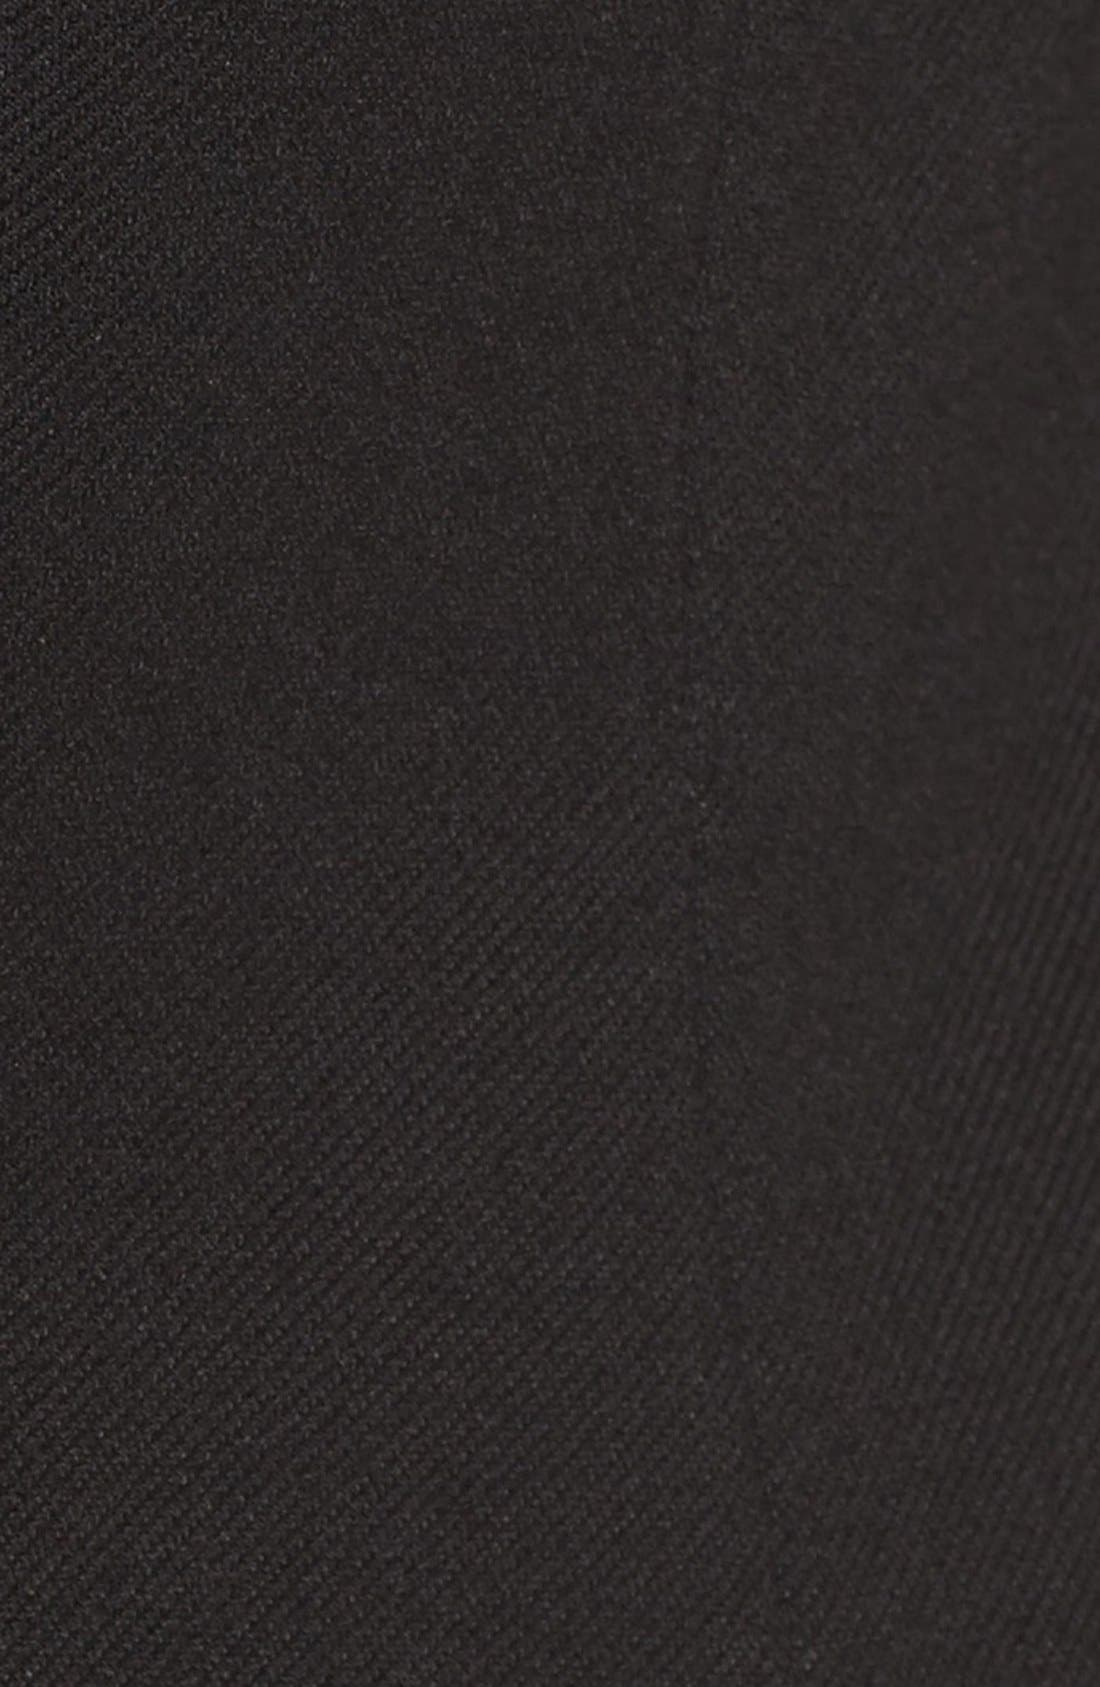 MADEWELL, Tribune Blazer, Alternate thumbnail 2, color, TRUE BLACK